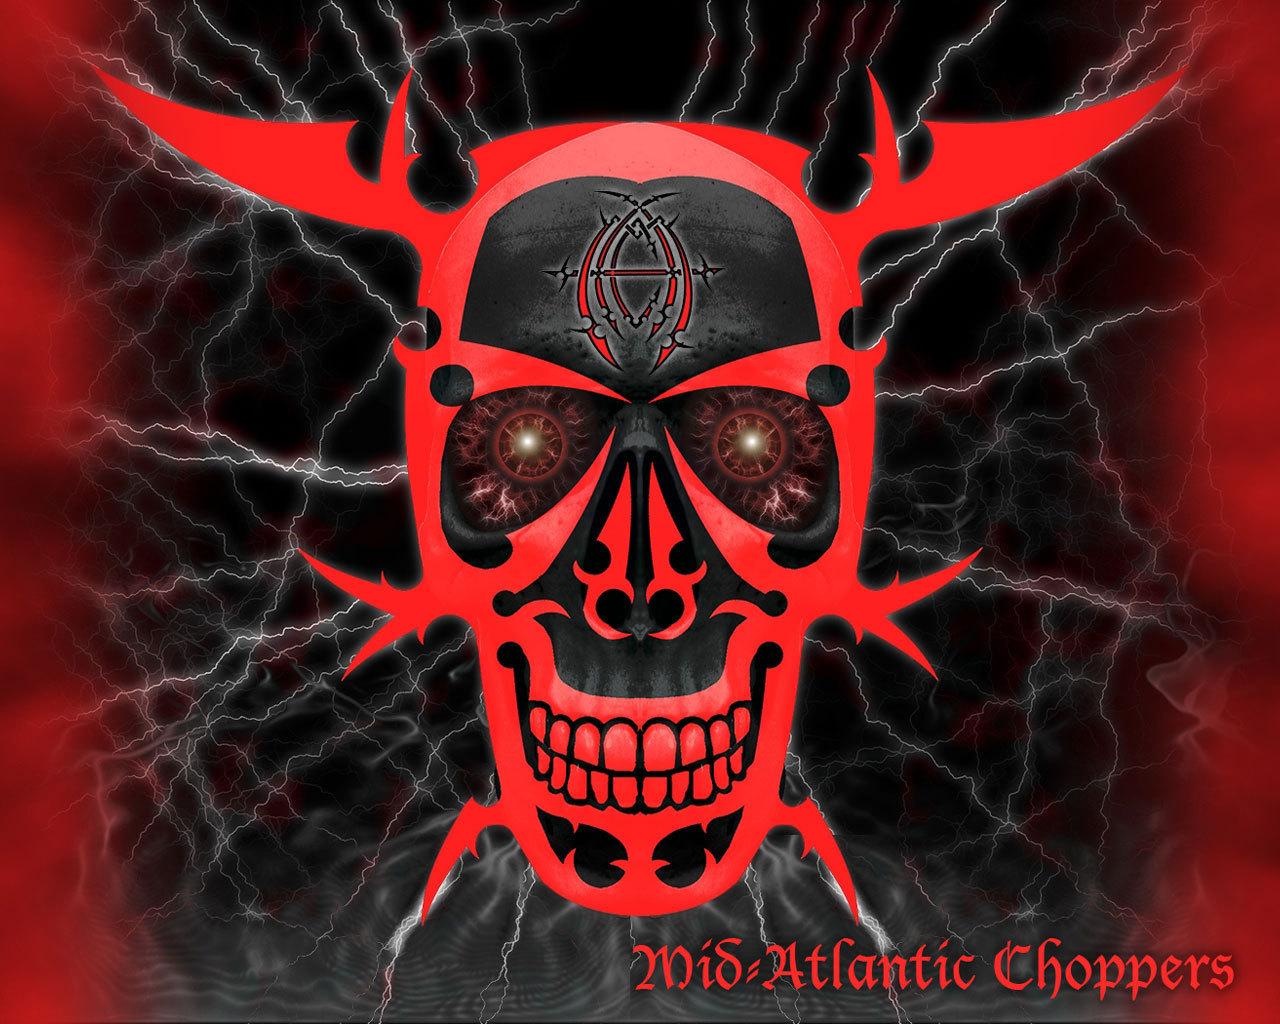 skulls - Skulls Photo ...